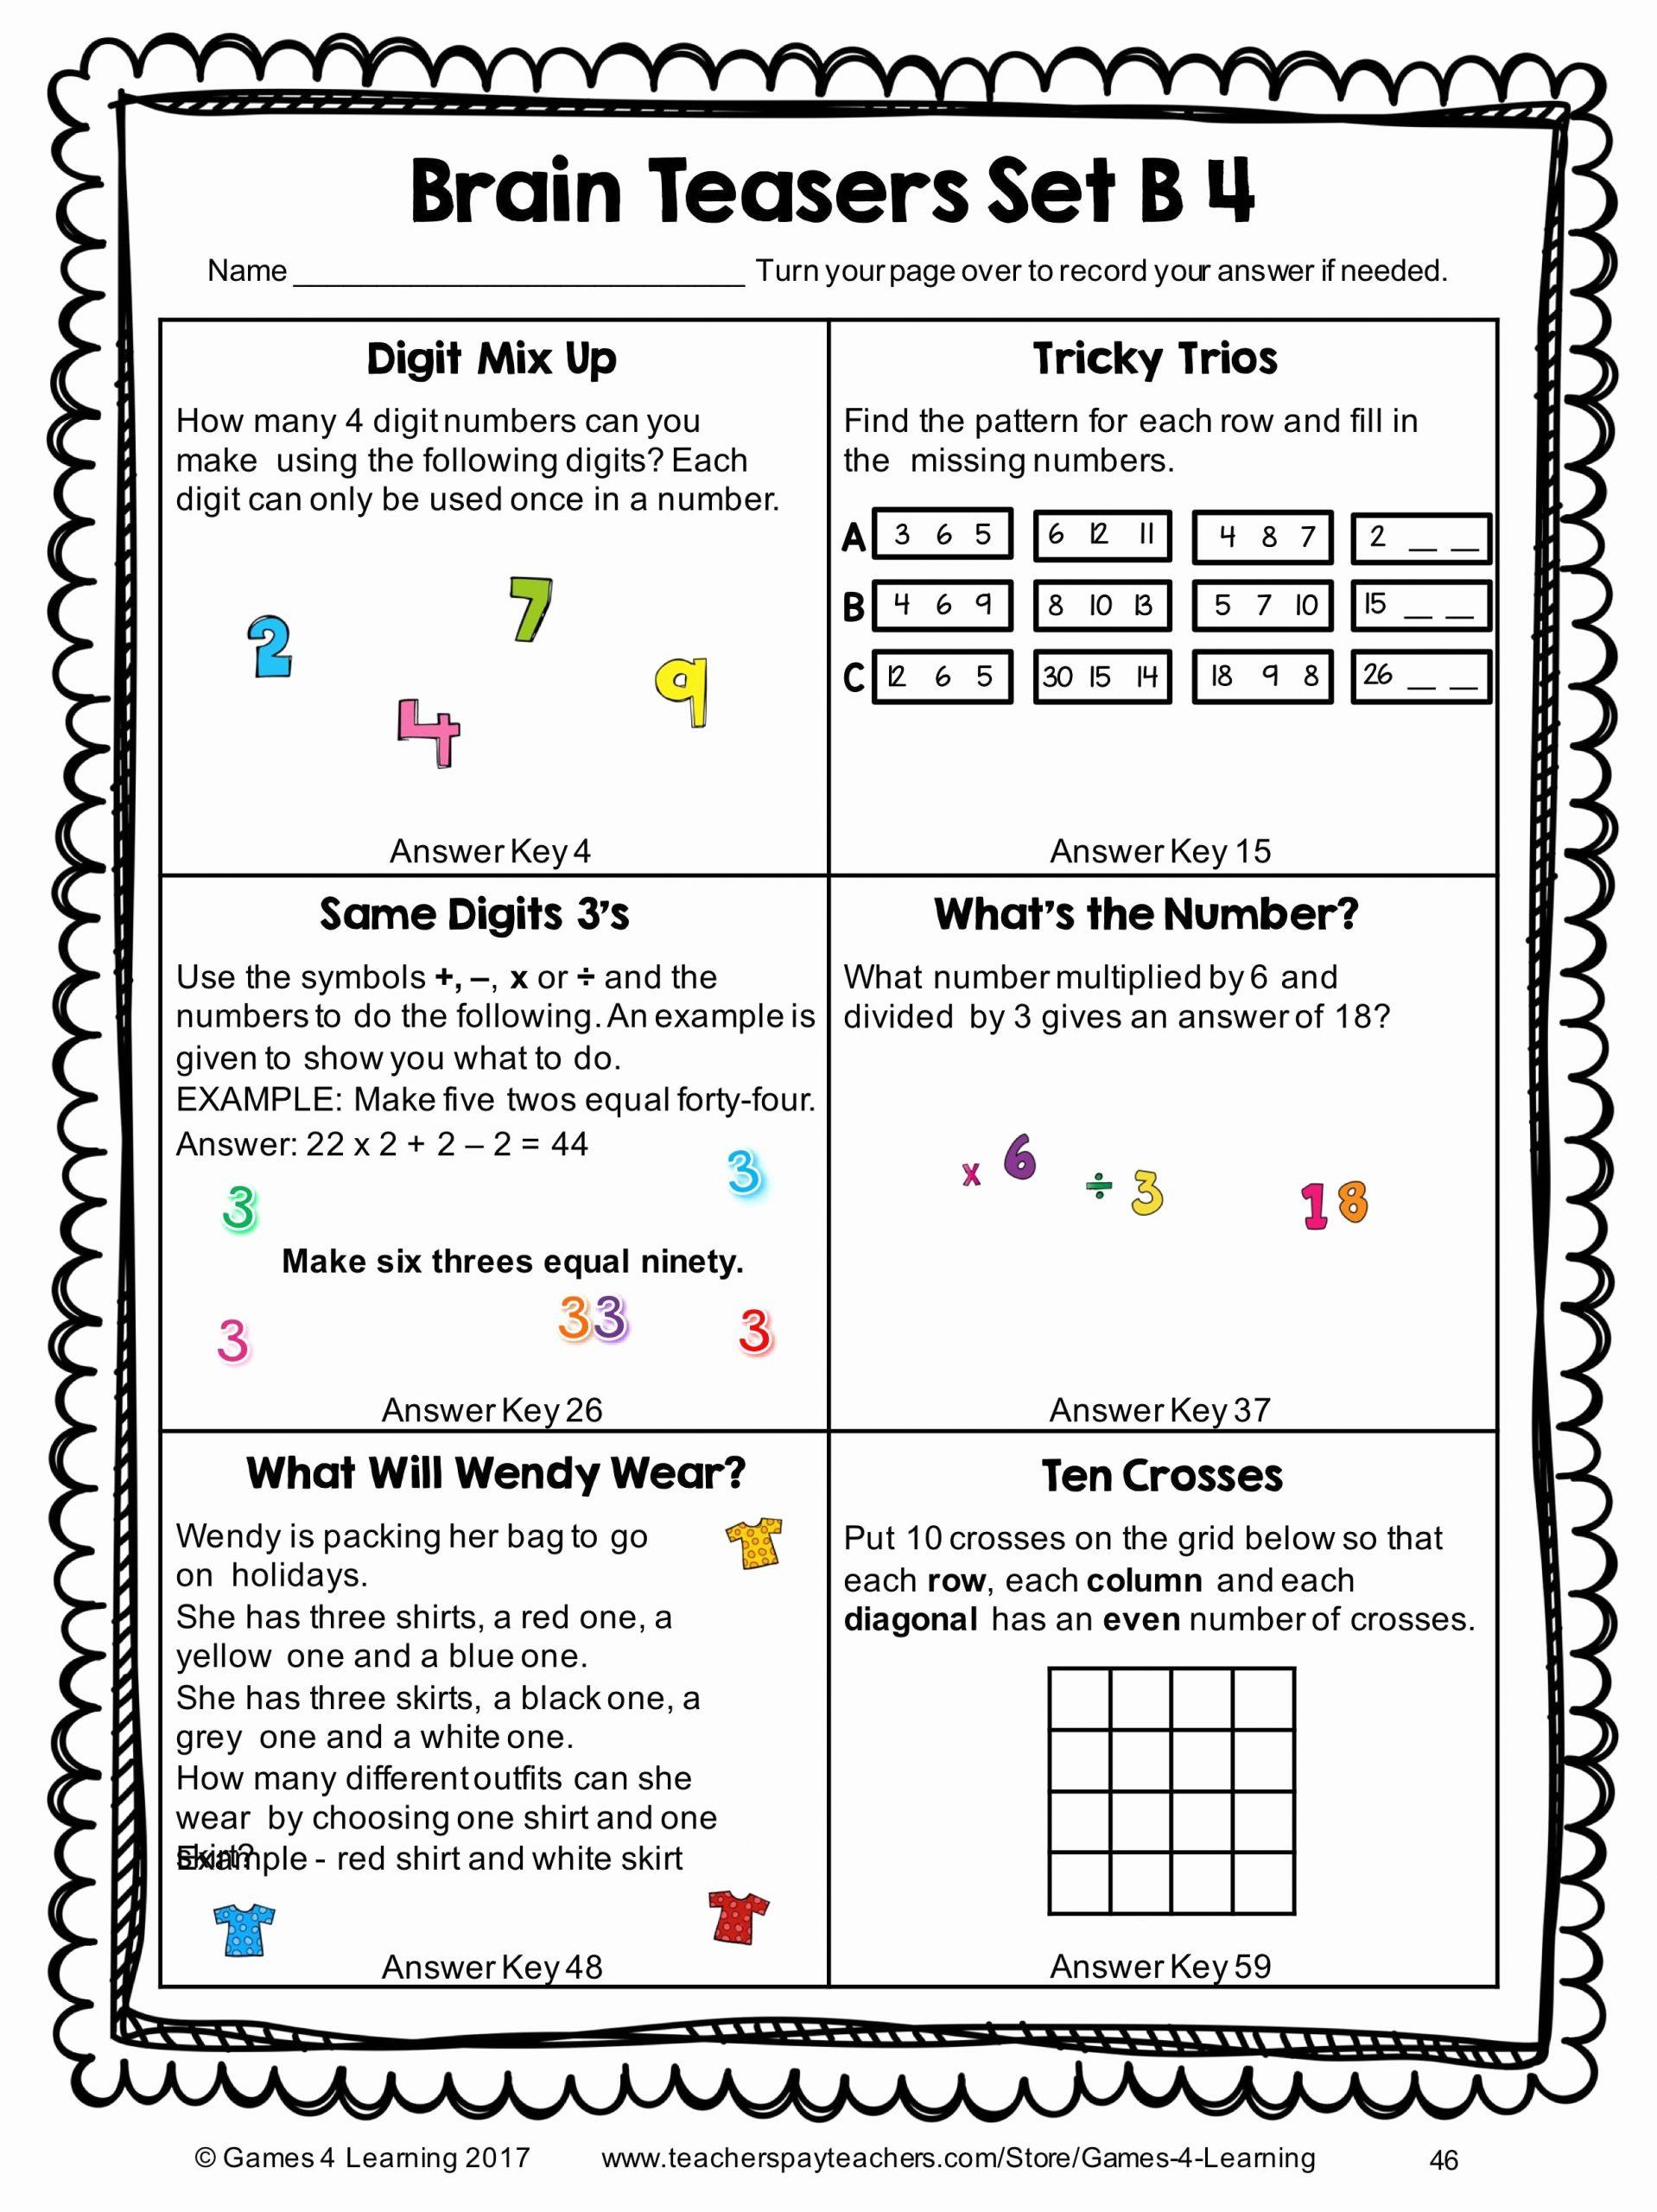 Brain Teaser Worksheets Elegant 6th Grade Brain Teasers Worksheets